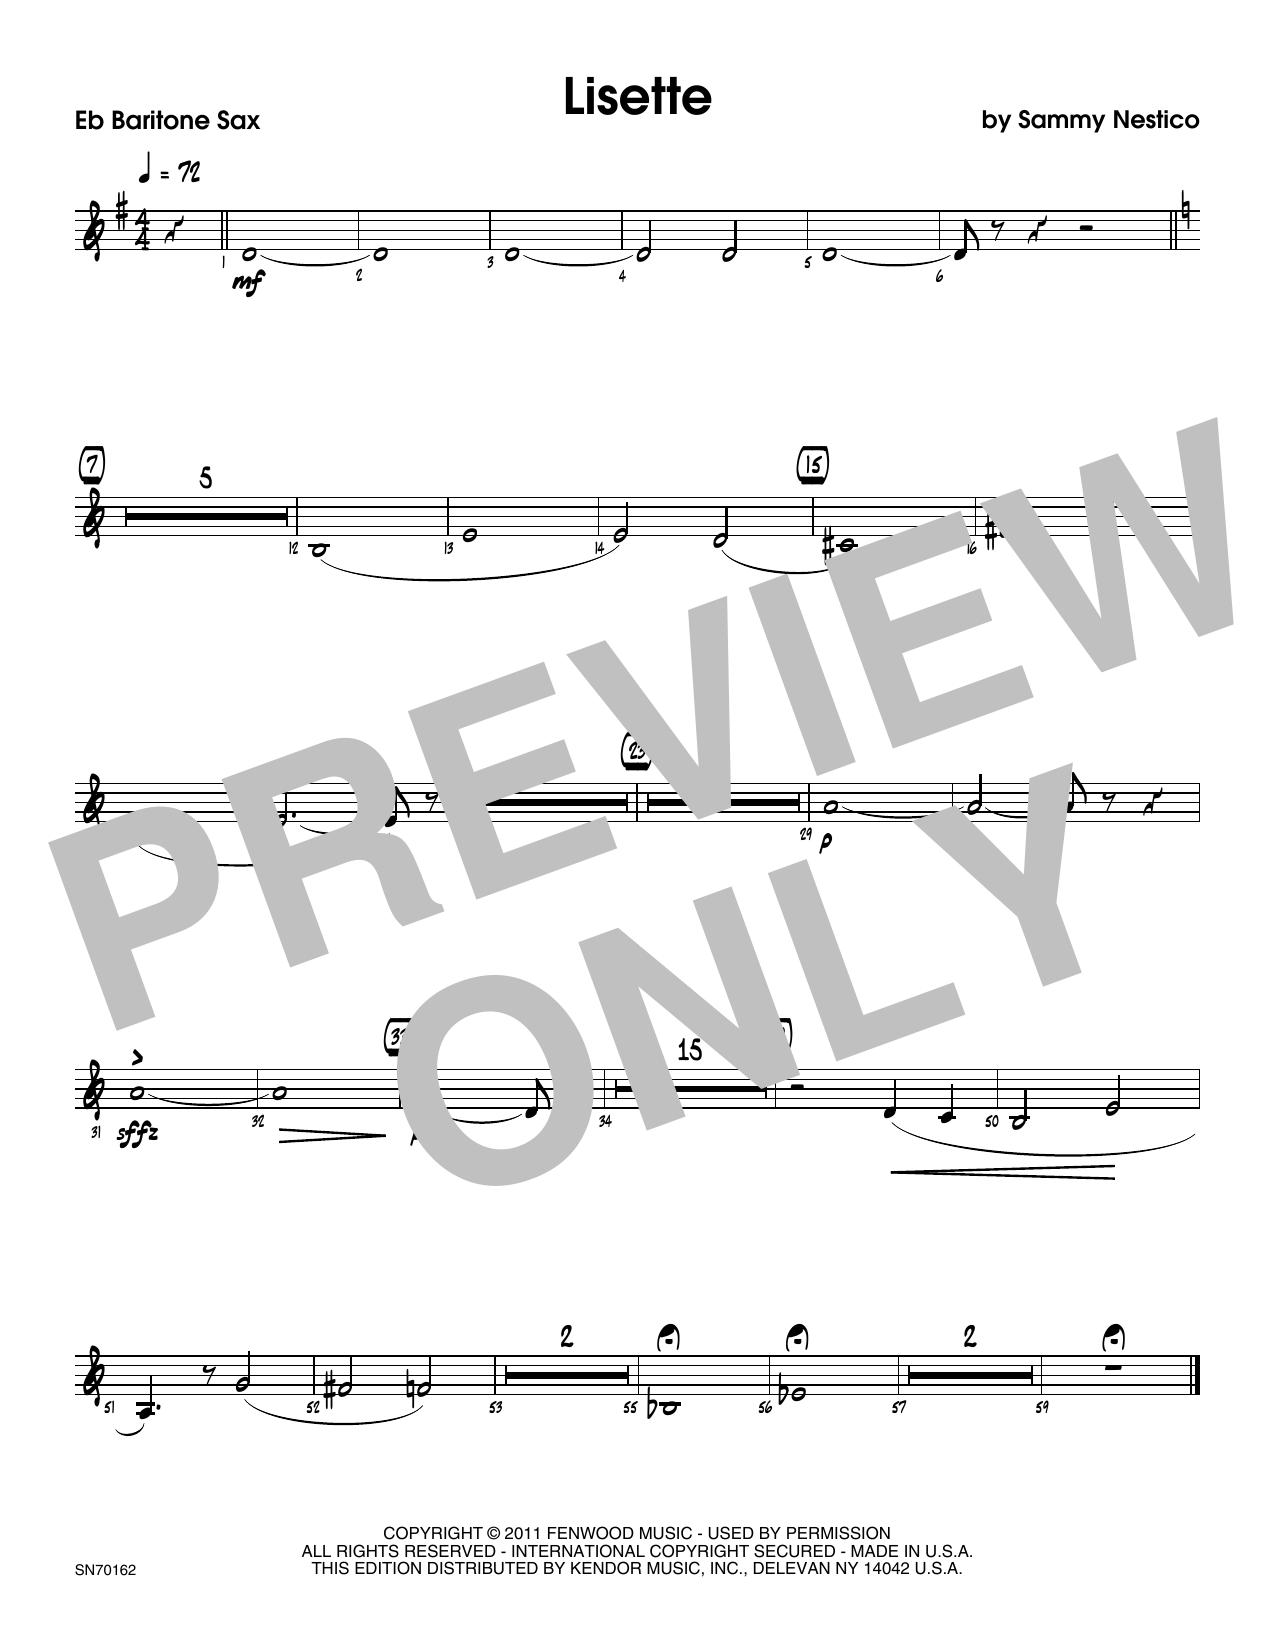 Lisette - Eb Baritone Saxophone Sheet Music